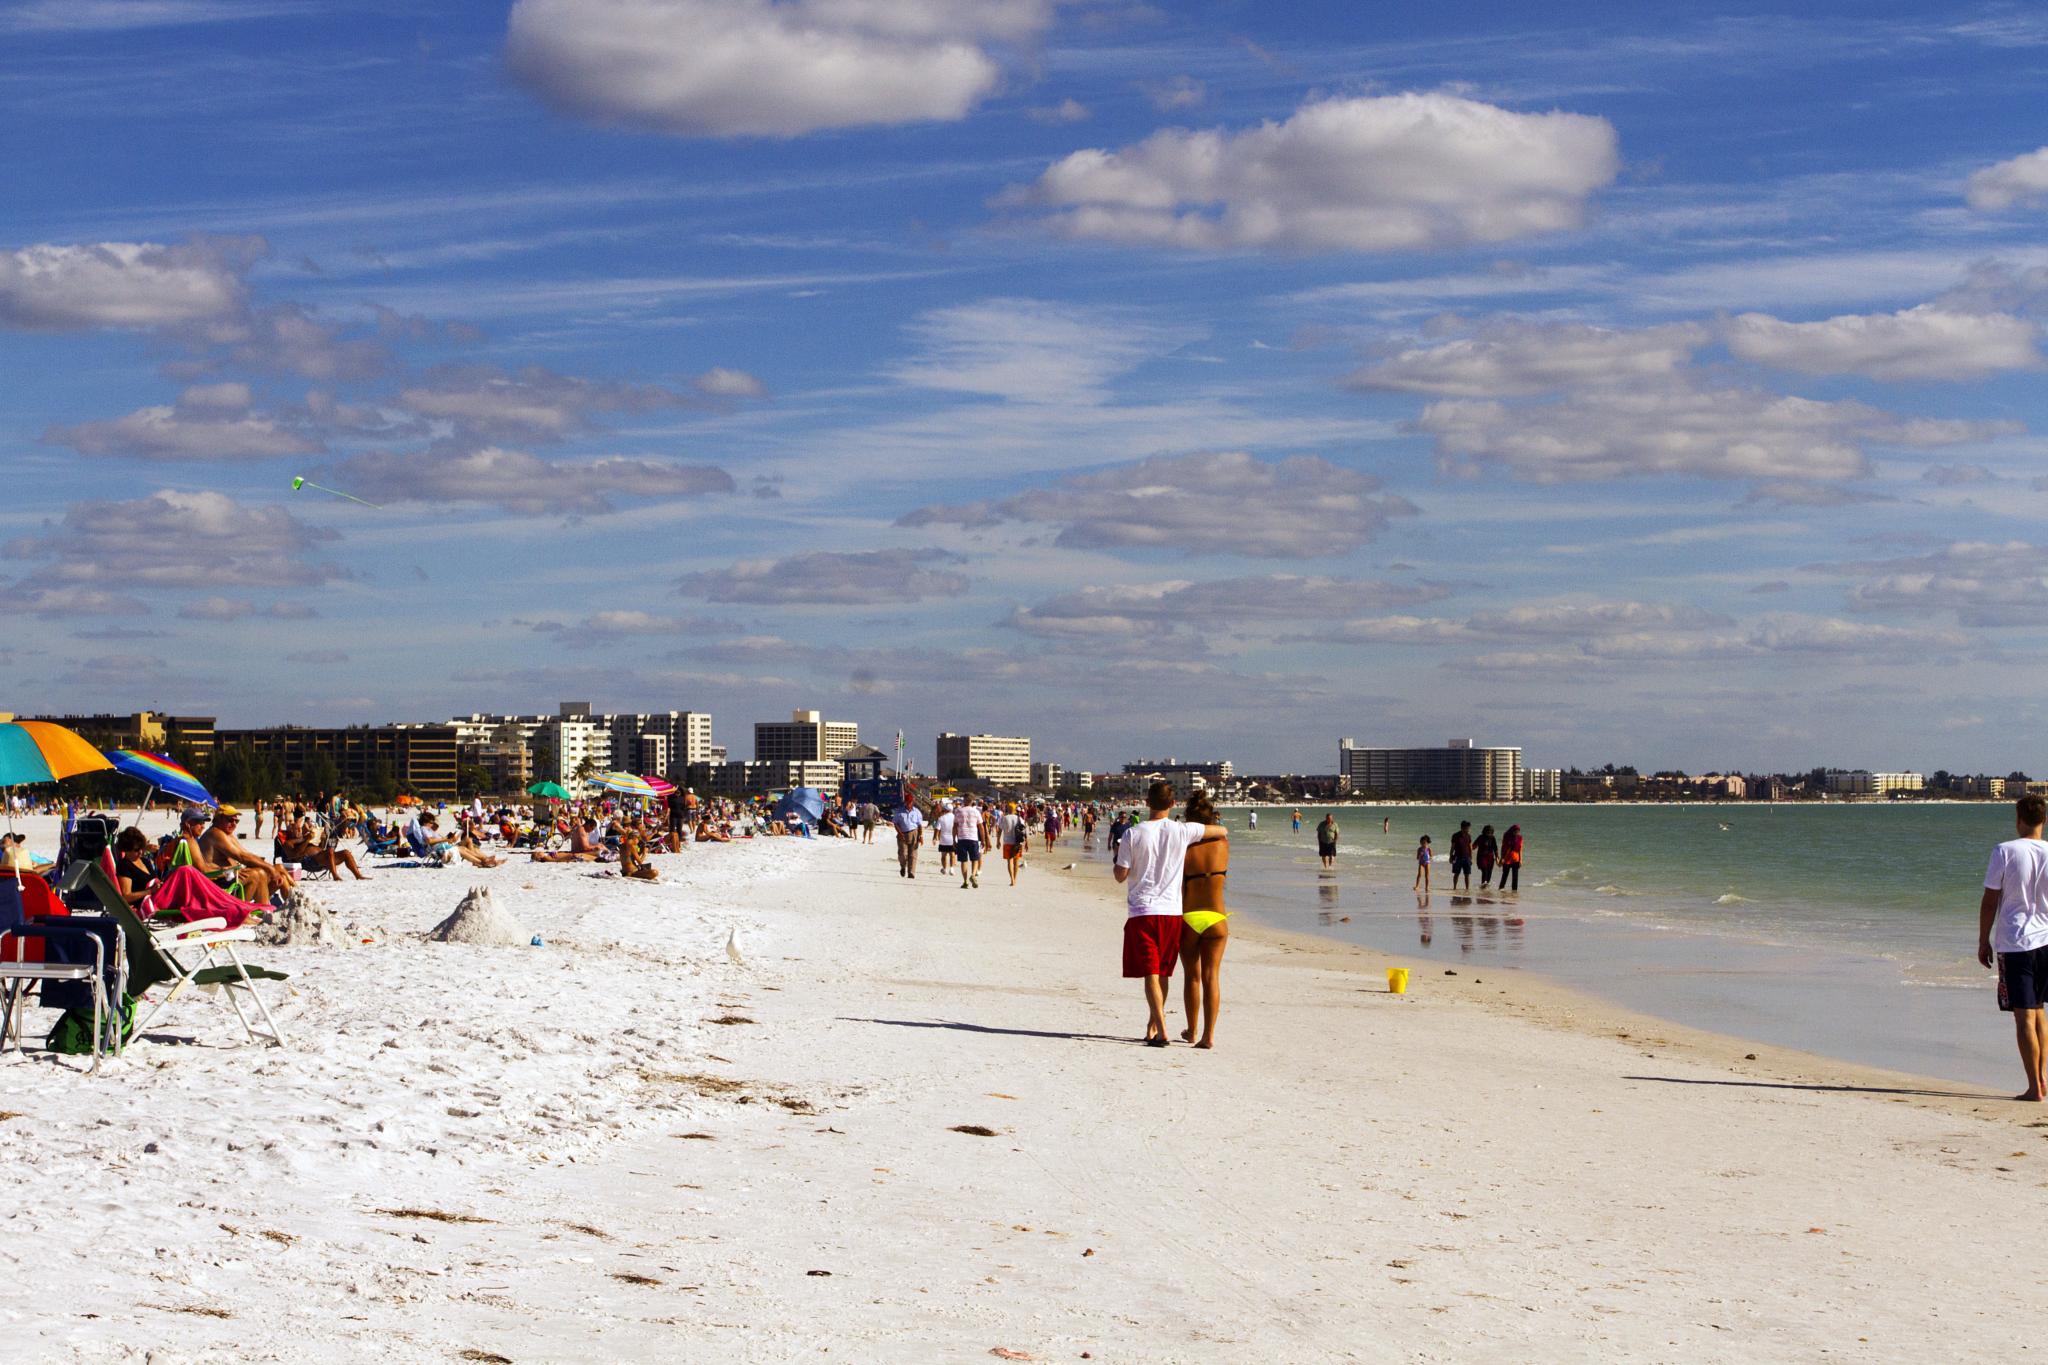 Beach Scenery by Joe Chrvala